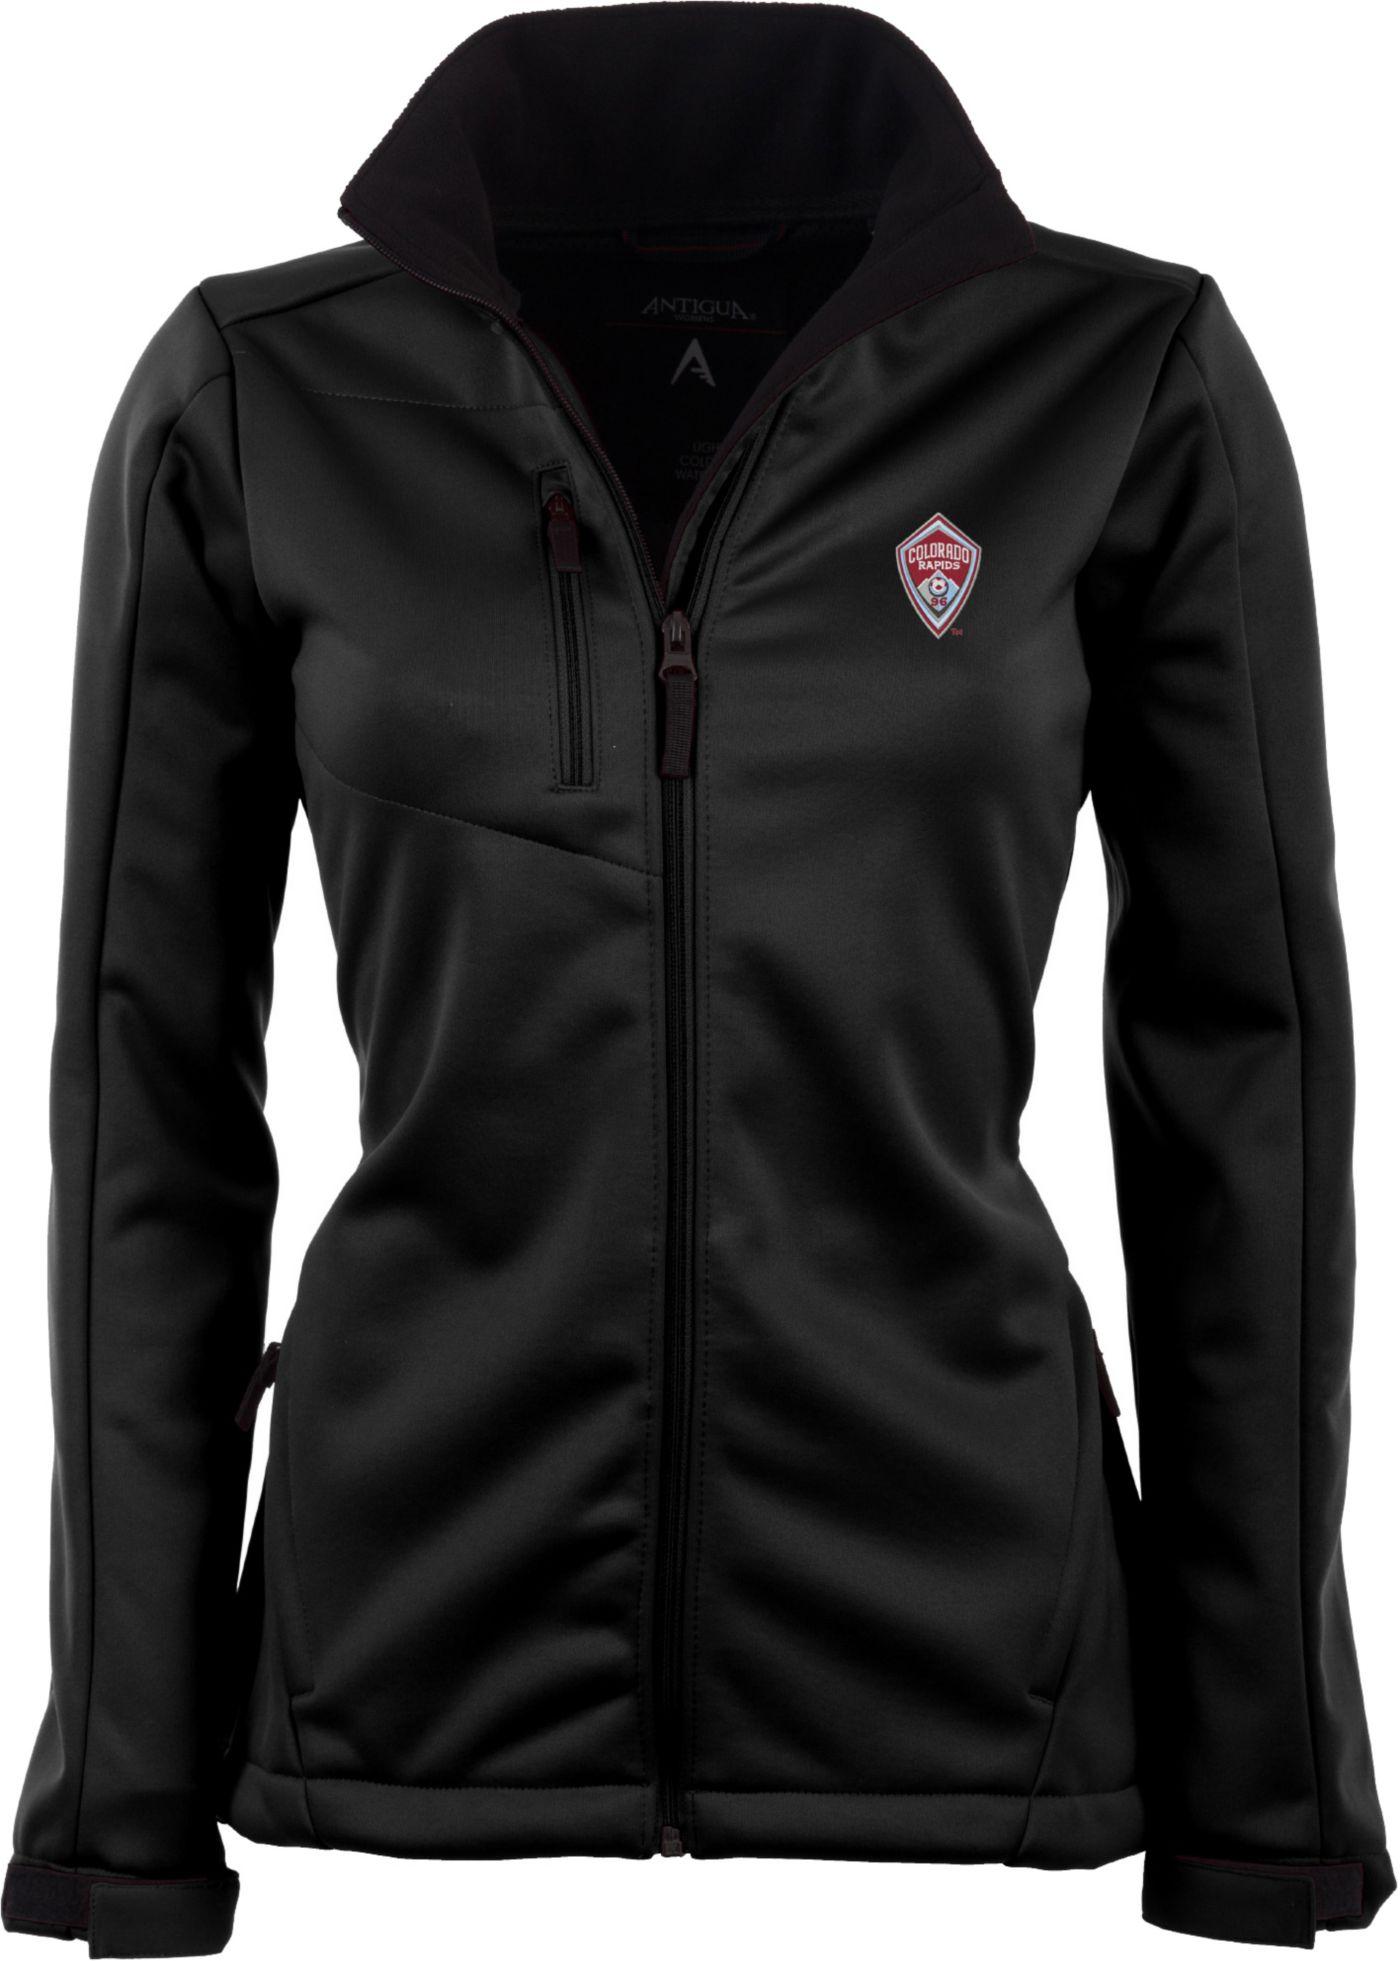 Antigua Women's Colorado Rapids Traverse Black Soft-Shell Full-Zip Jacket